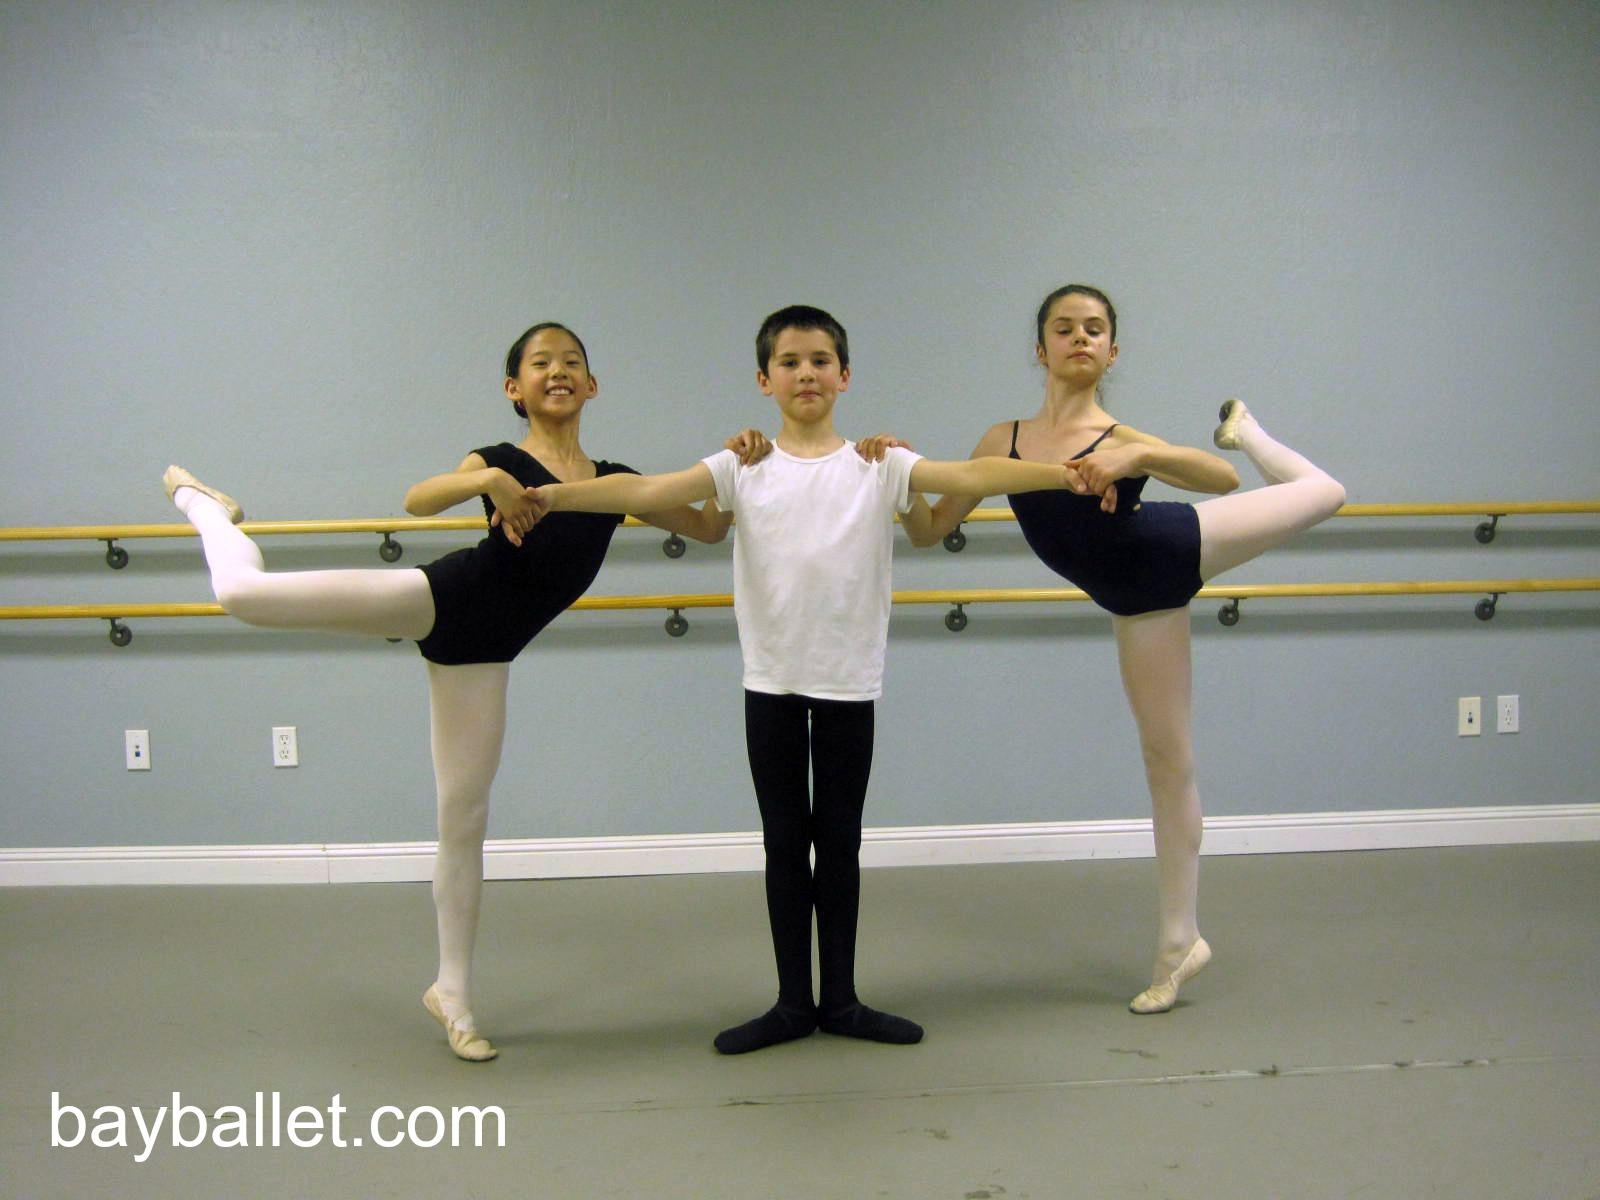 Bay_Ballet_Academy_San_Jose_Willow_Glen_Maximo_Califano_Dance_Classes_Jazz_Lyrical_Hip_Hop_Modern_Neoclassical_Class_5